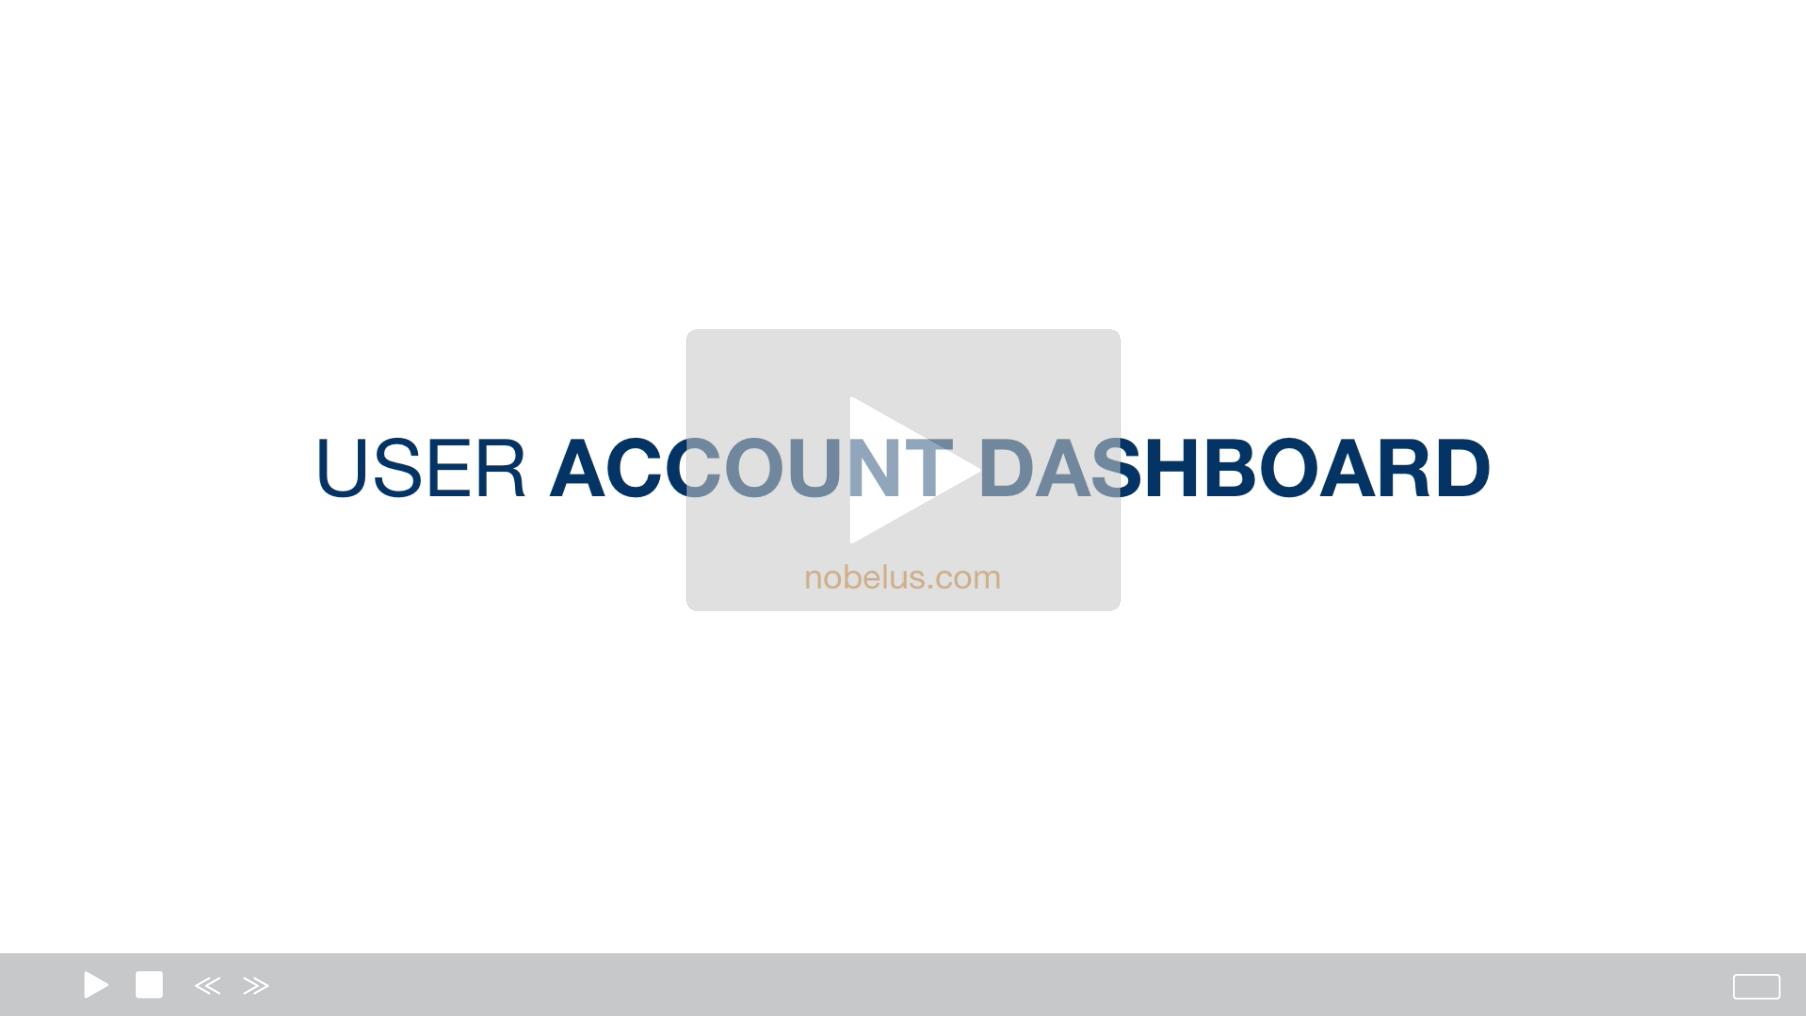 User Account Dashboard